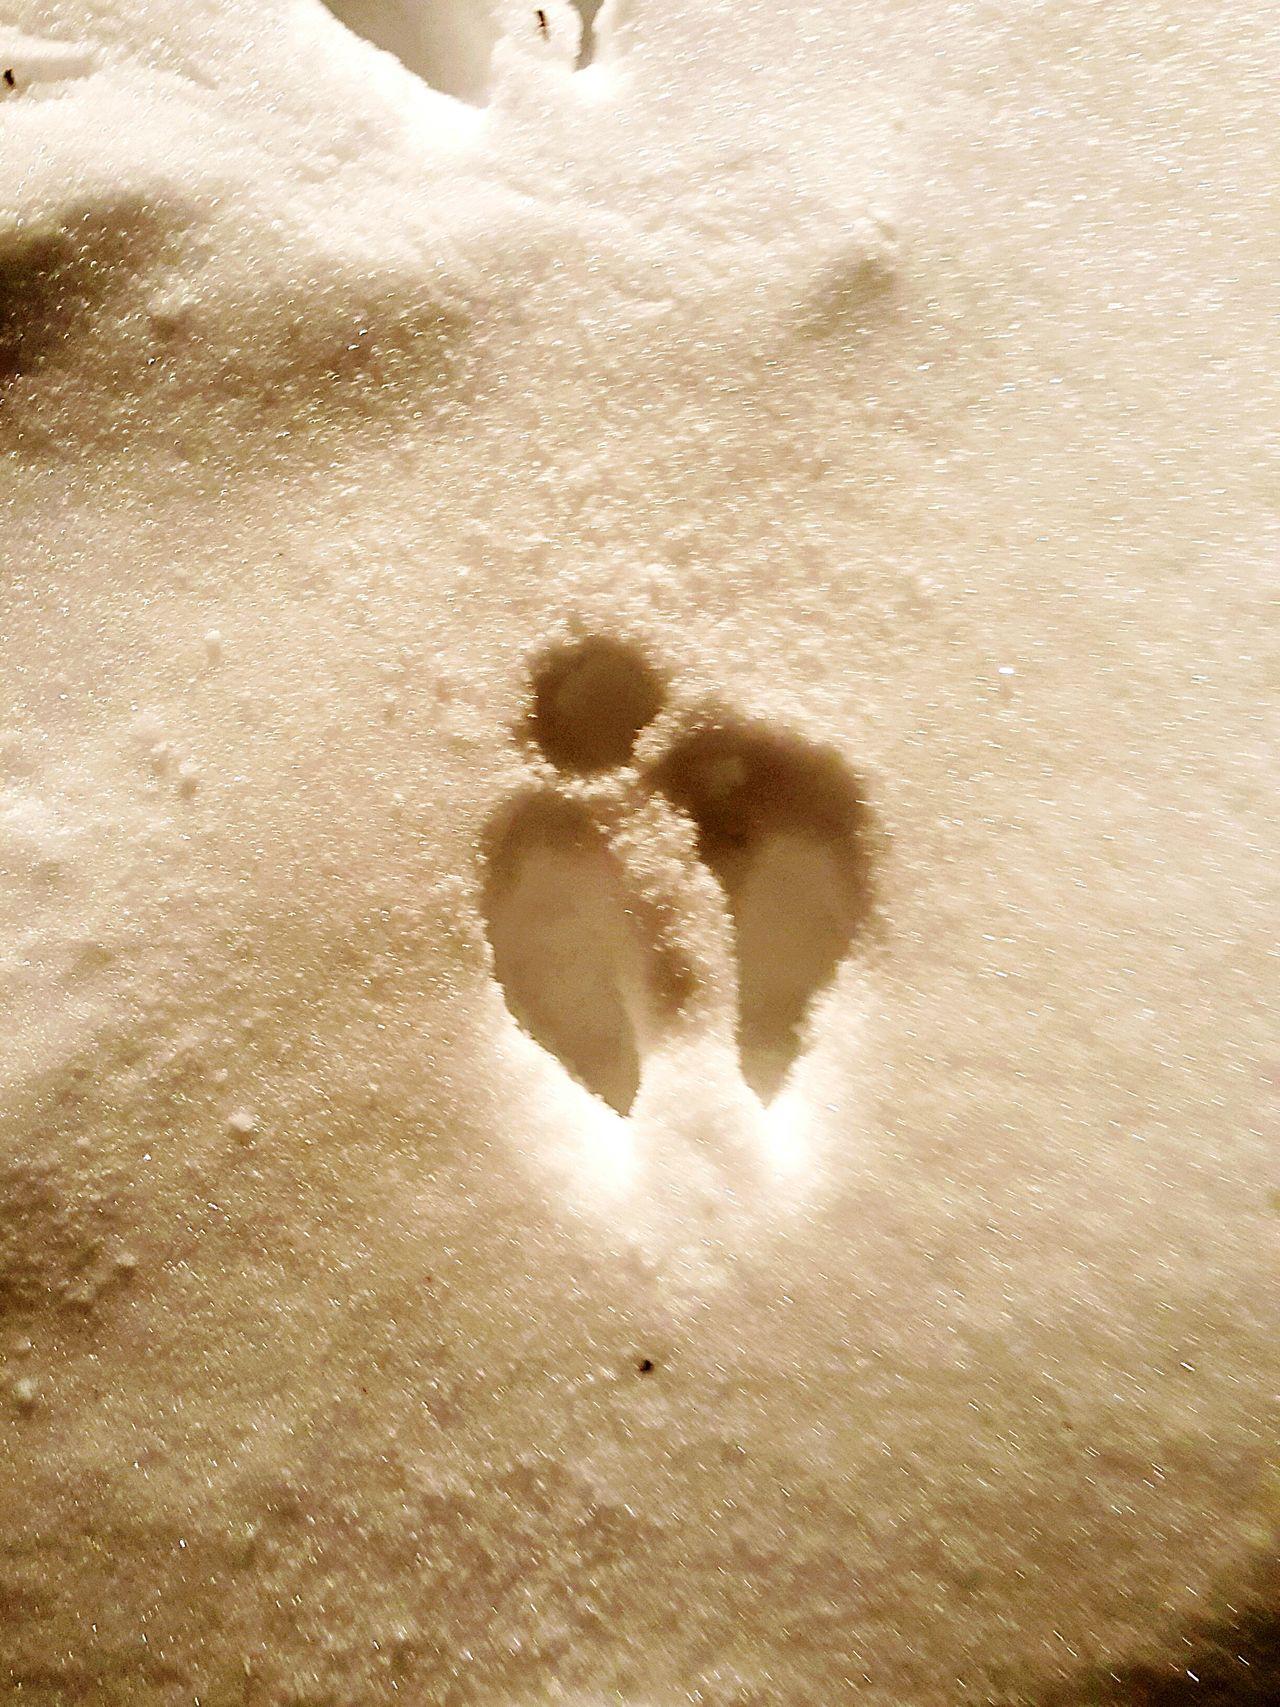 Blizzard 2016 Animal Prints Deer Tracks Snowscape Winter Snow ❄